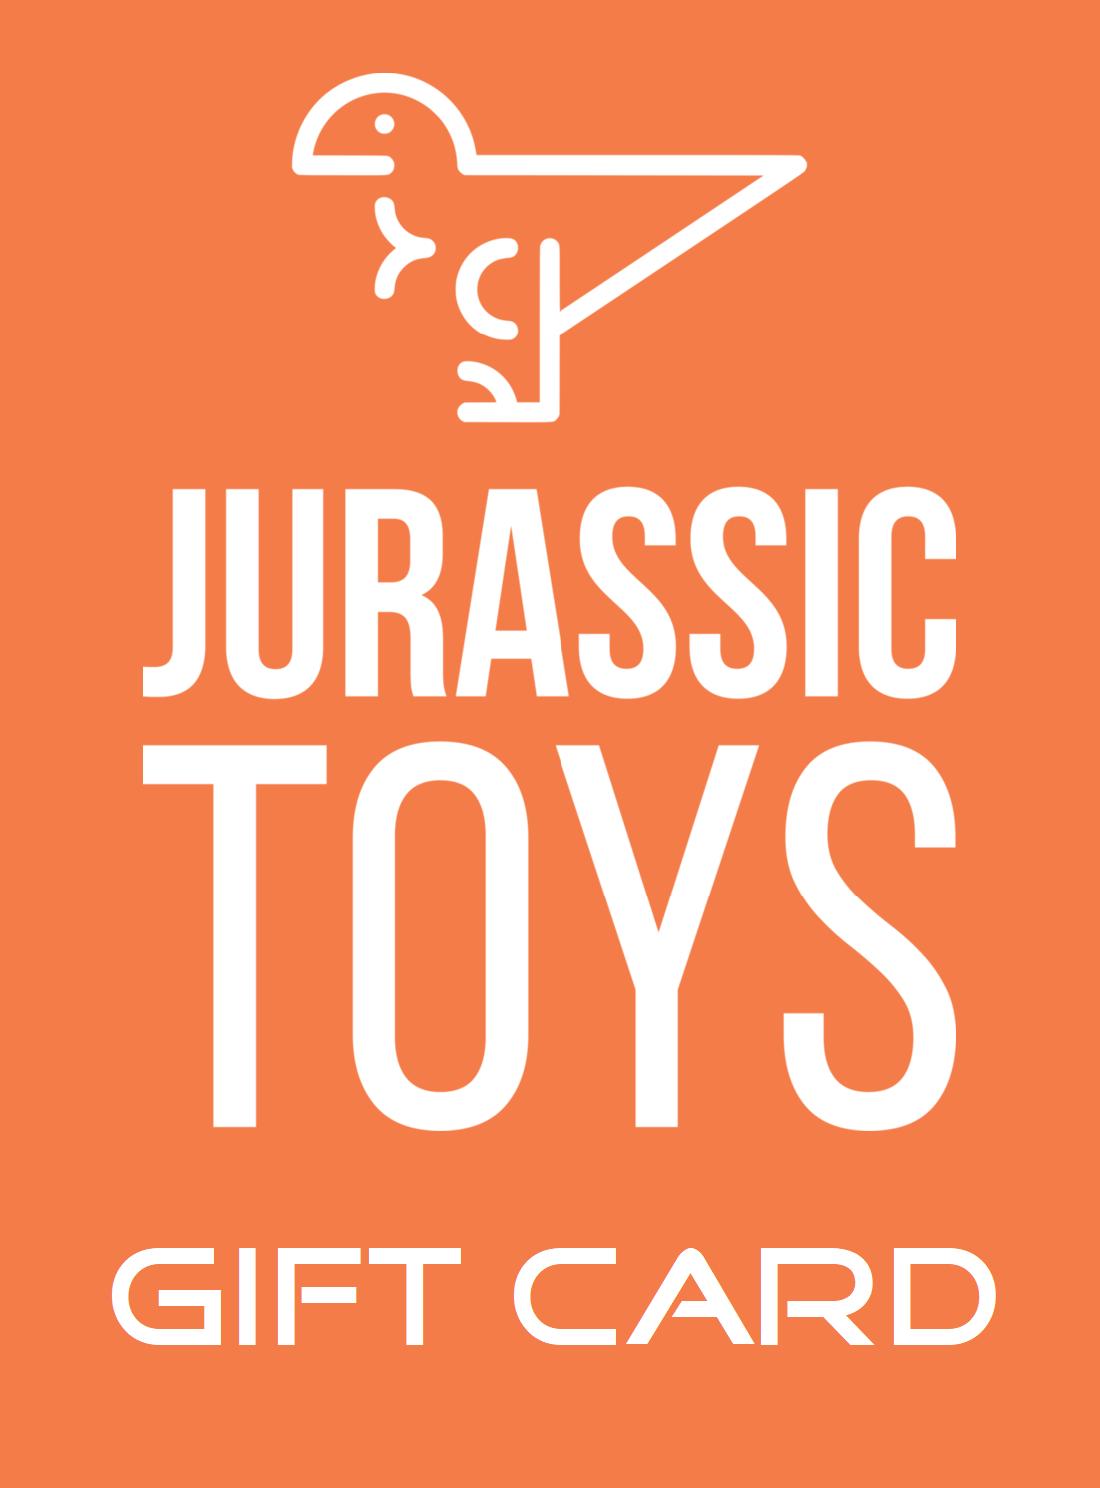 Jurassic Toys Gift Card